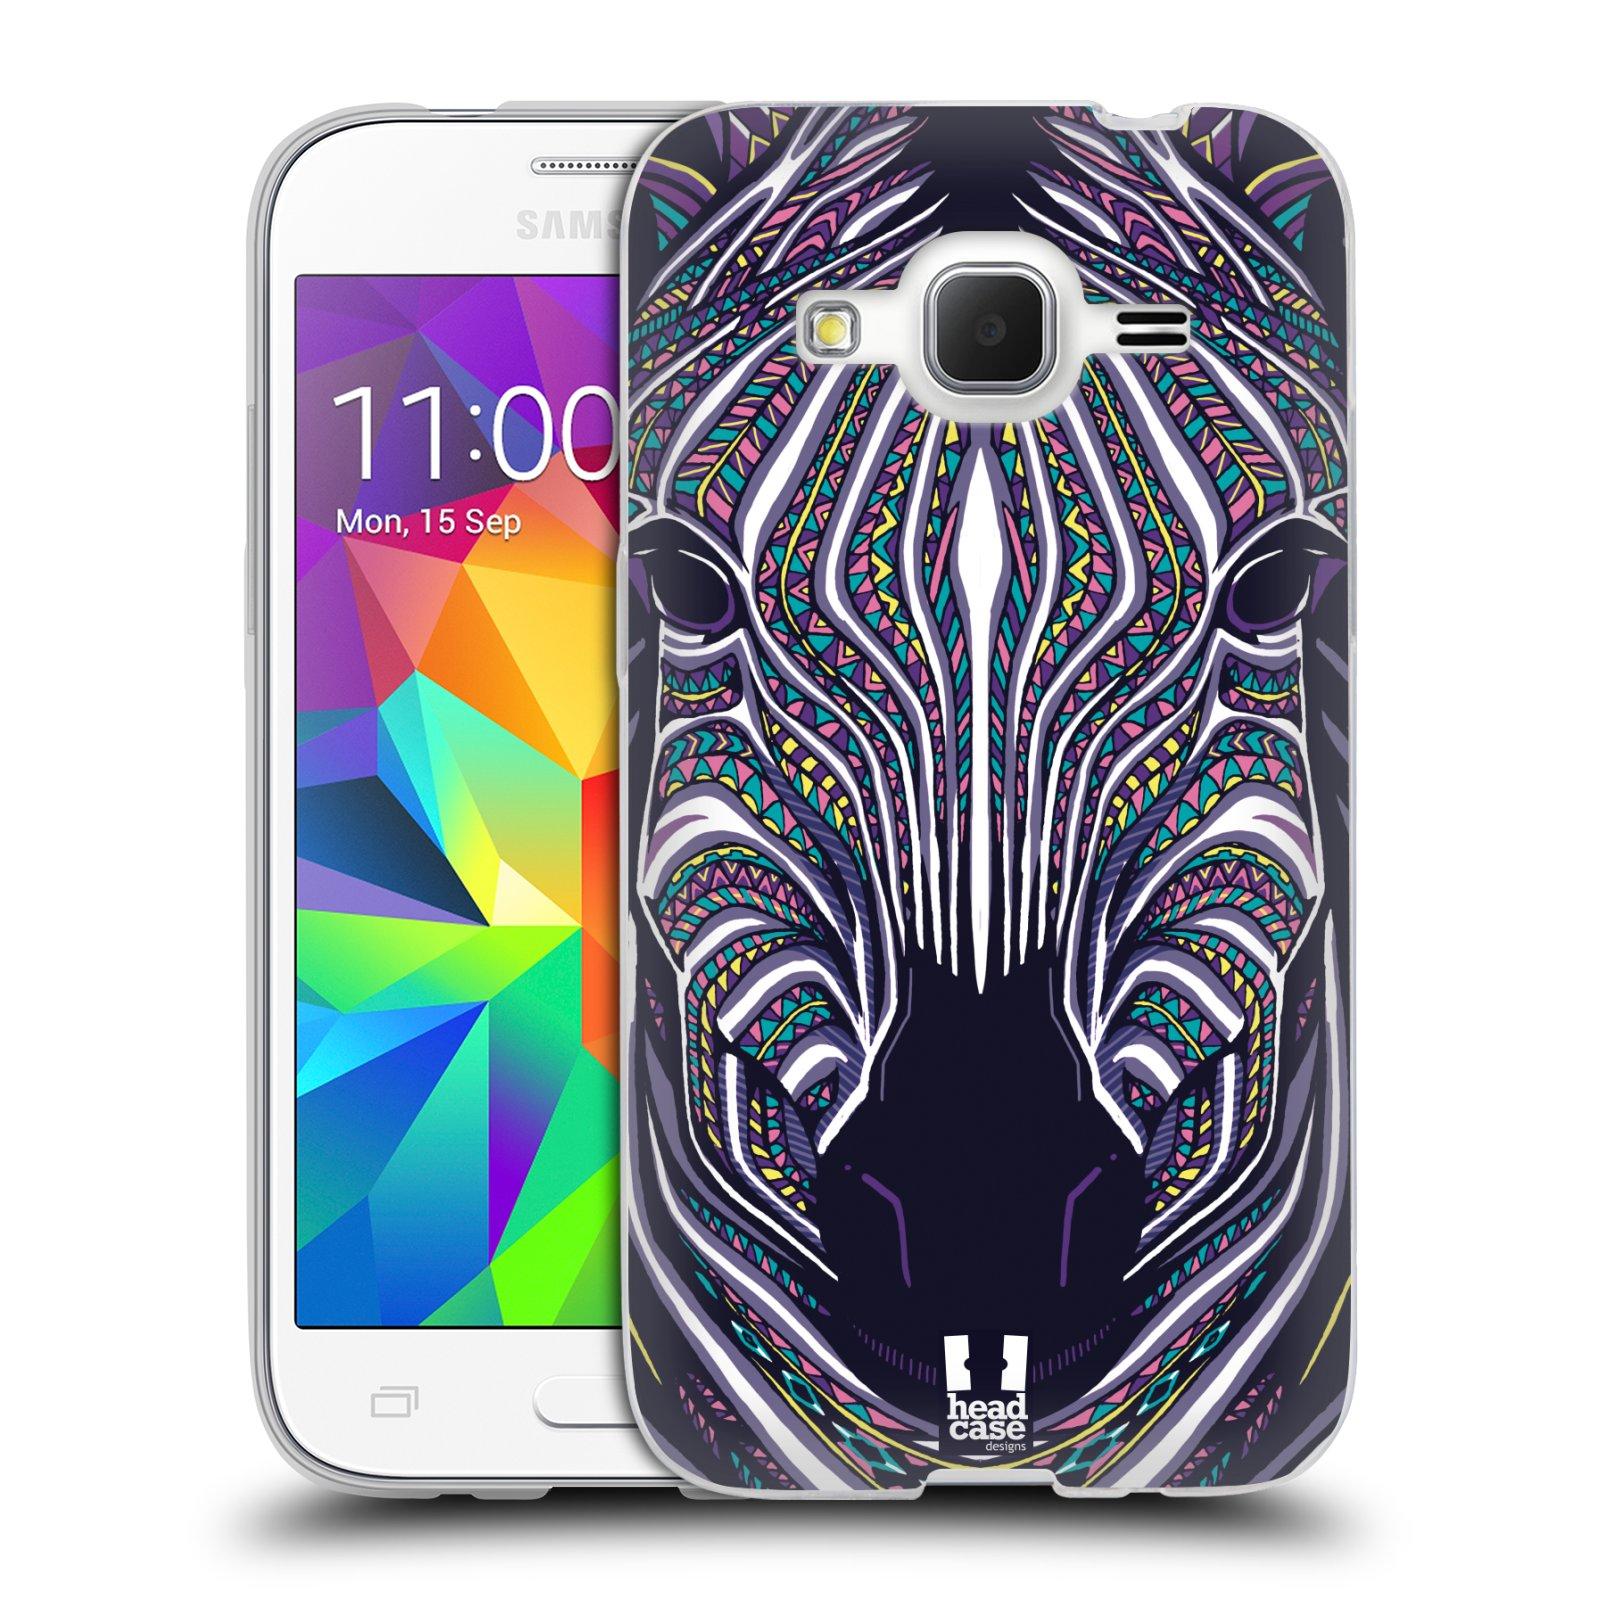 Silikonové pouzdro na mobil Samsung Galaxy Core Prime LTE HEAD CASE AZTEC ZEBRA